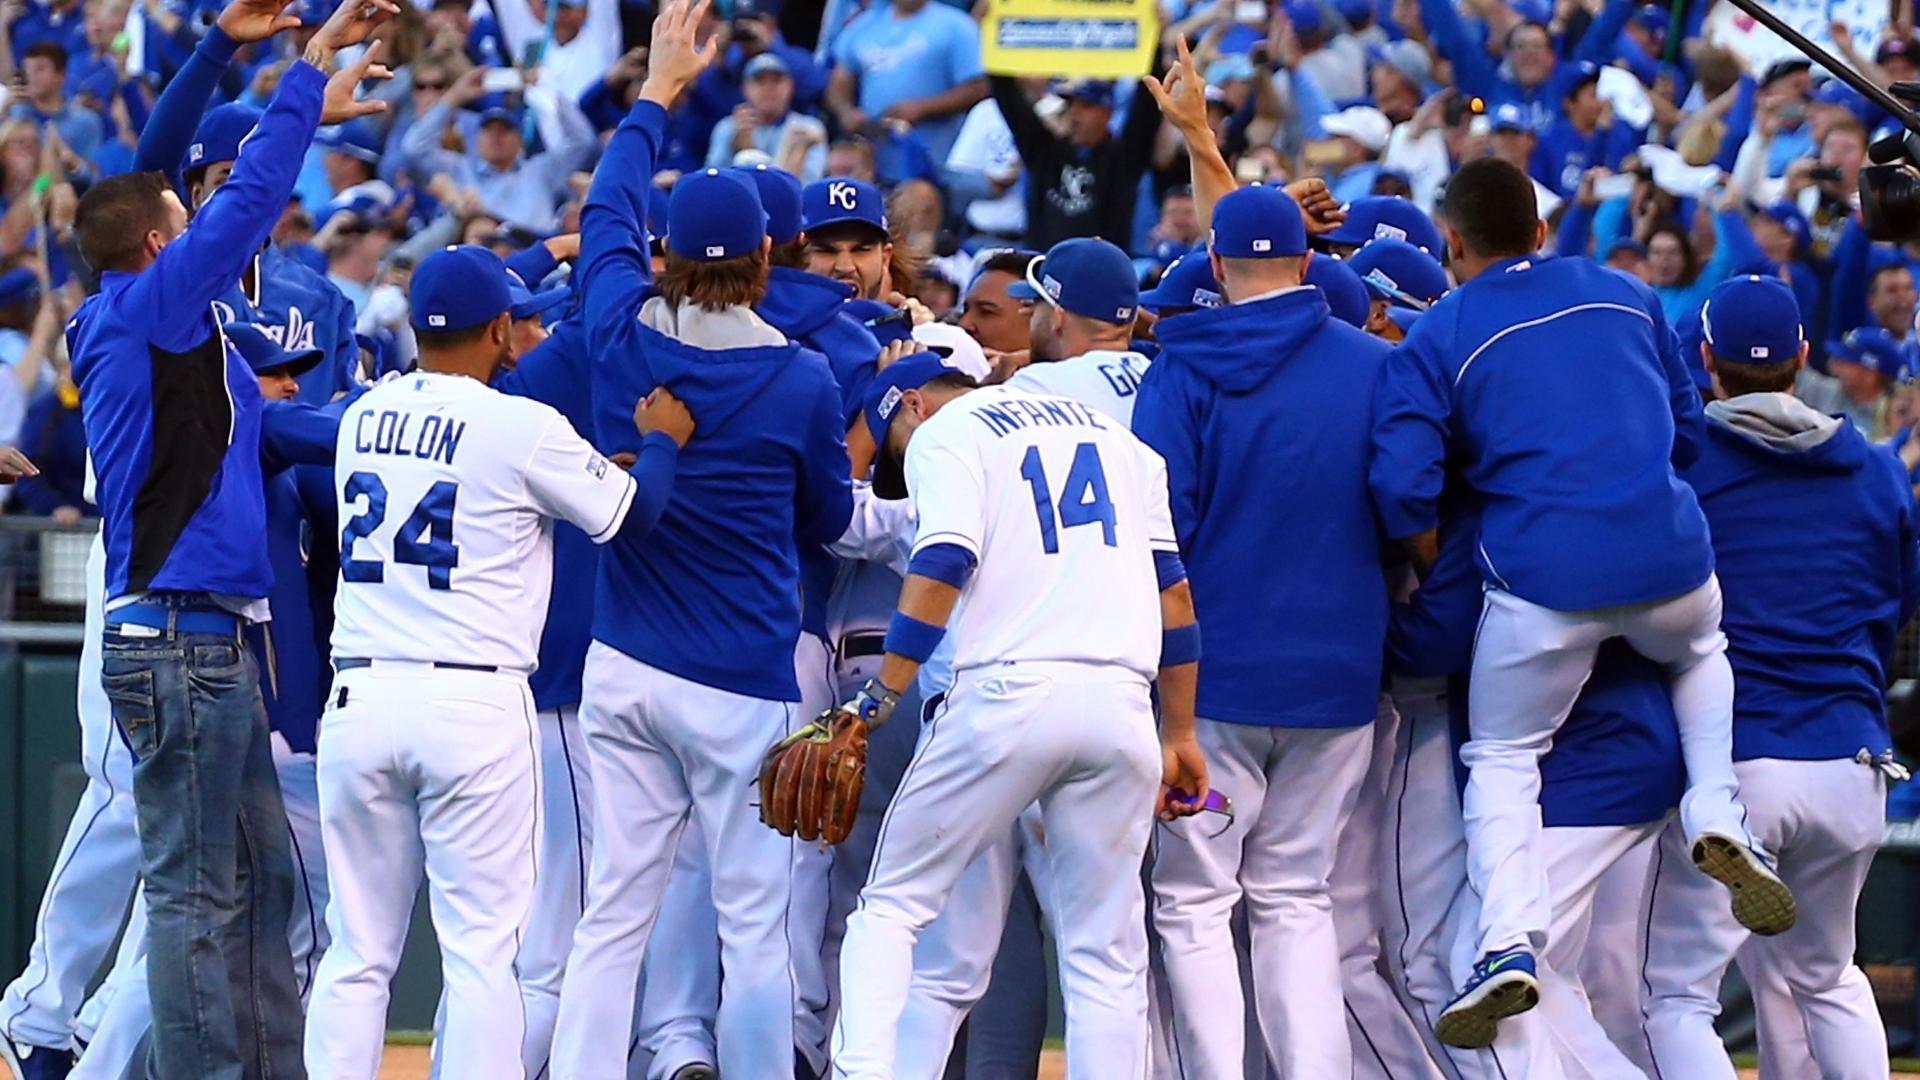 2014 World Series